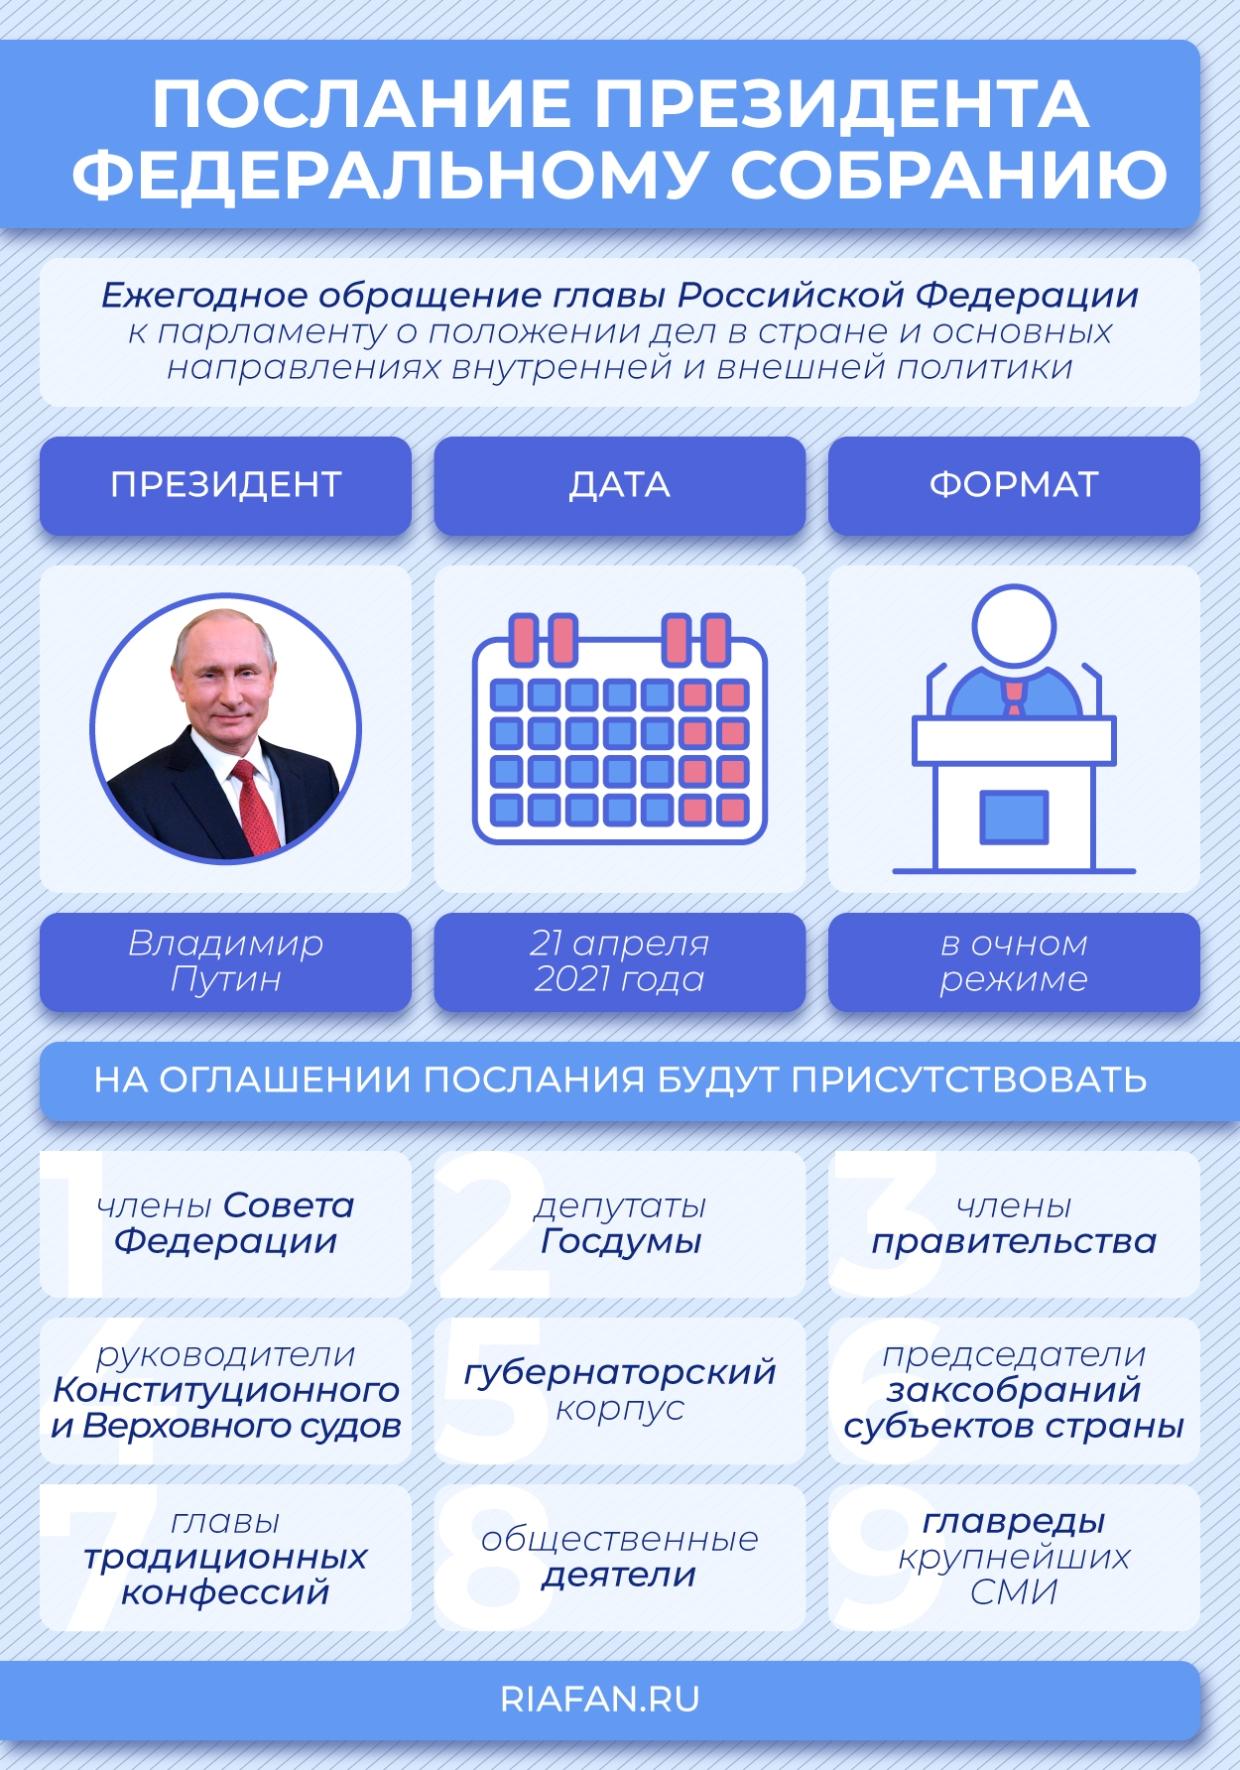 Послание президента РФ Федеральному собранию намечено на 21 апреля